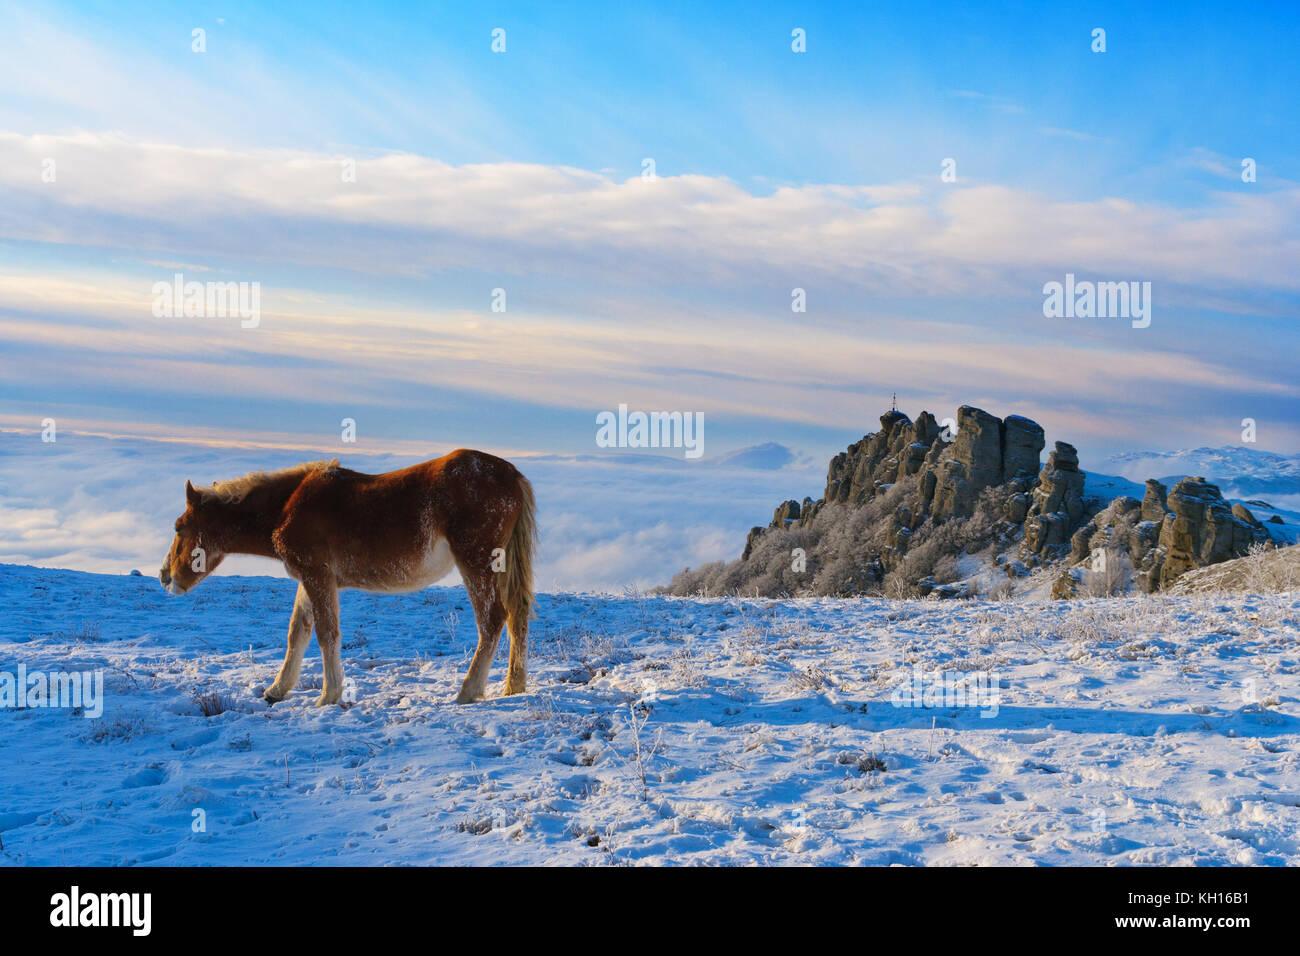 Wild horses in the winter